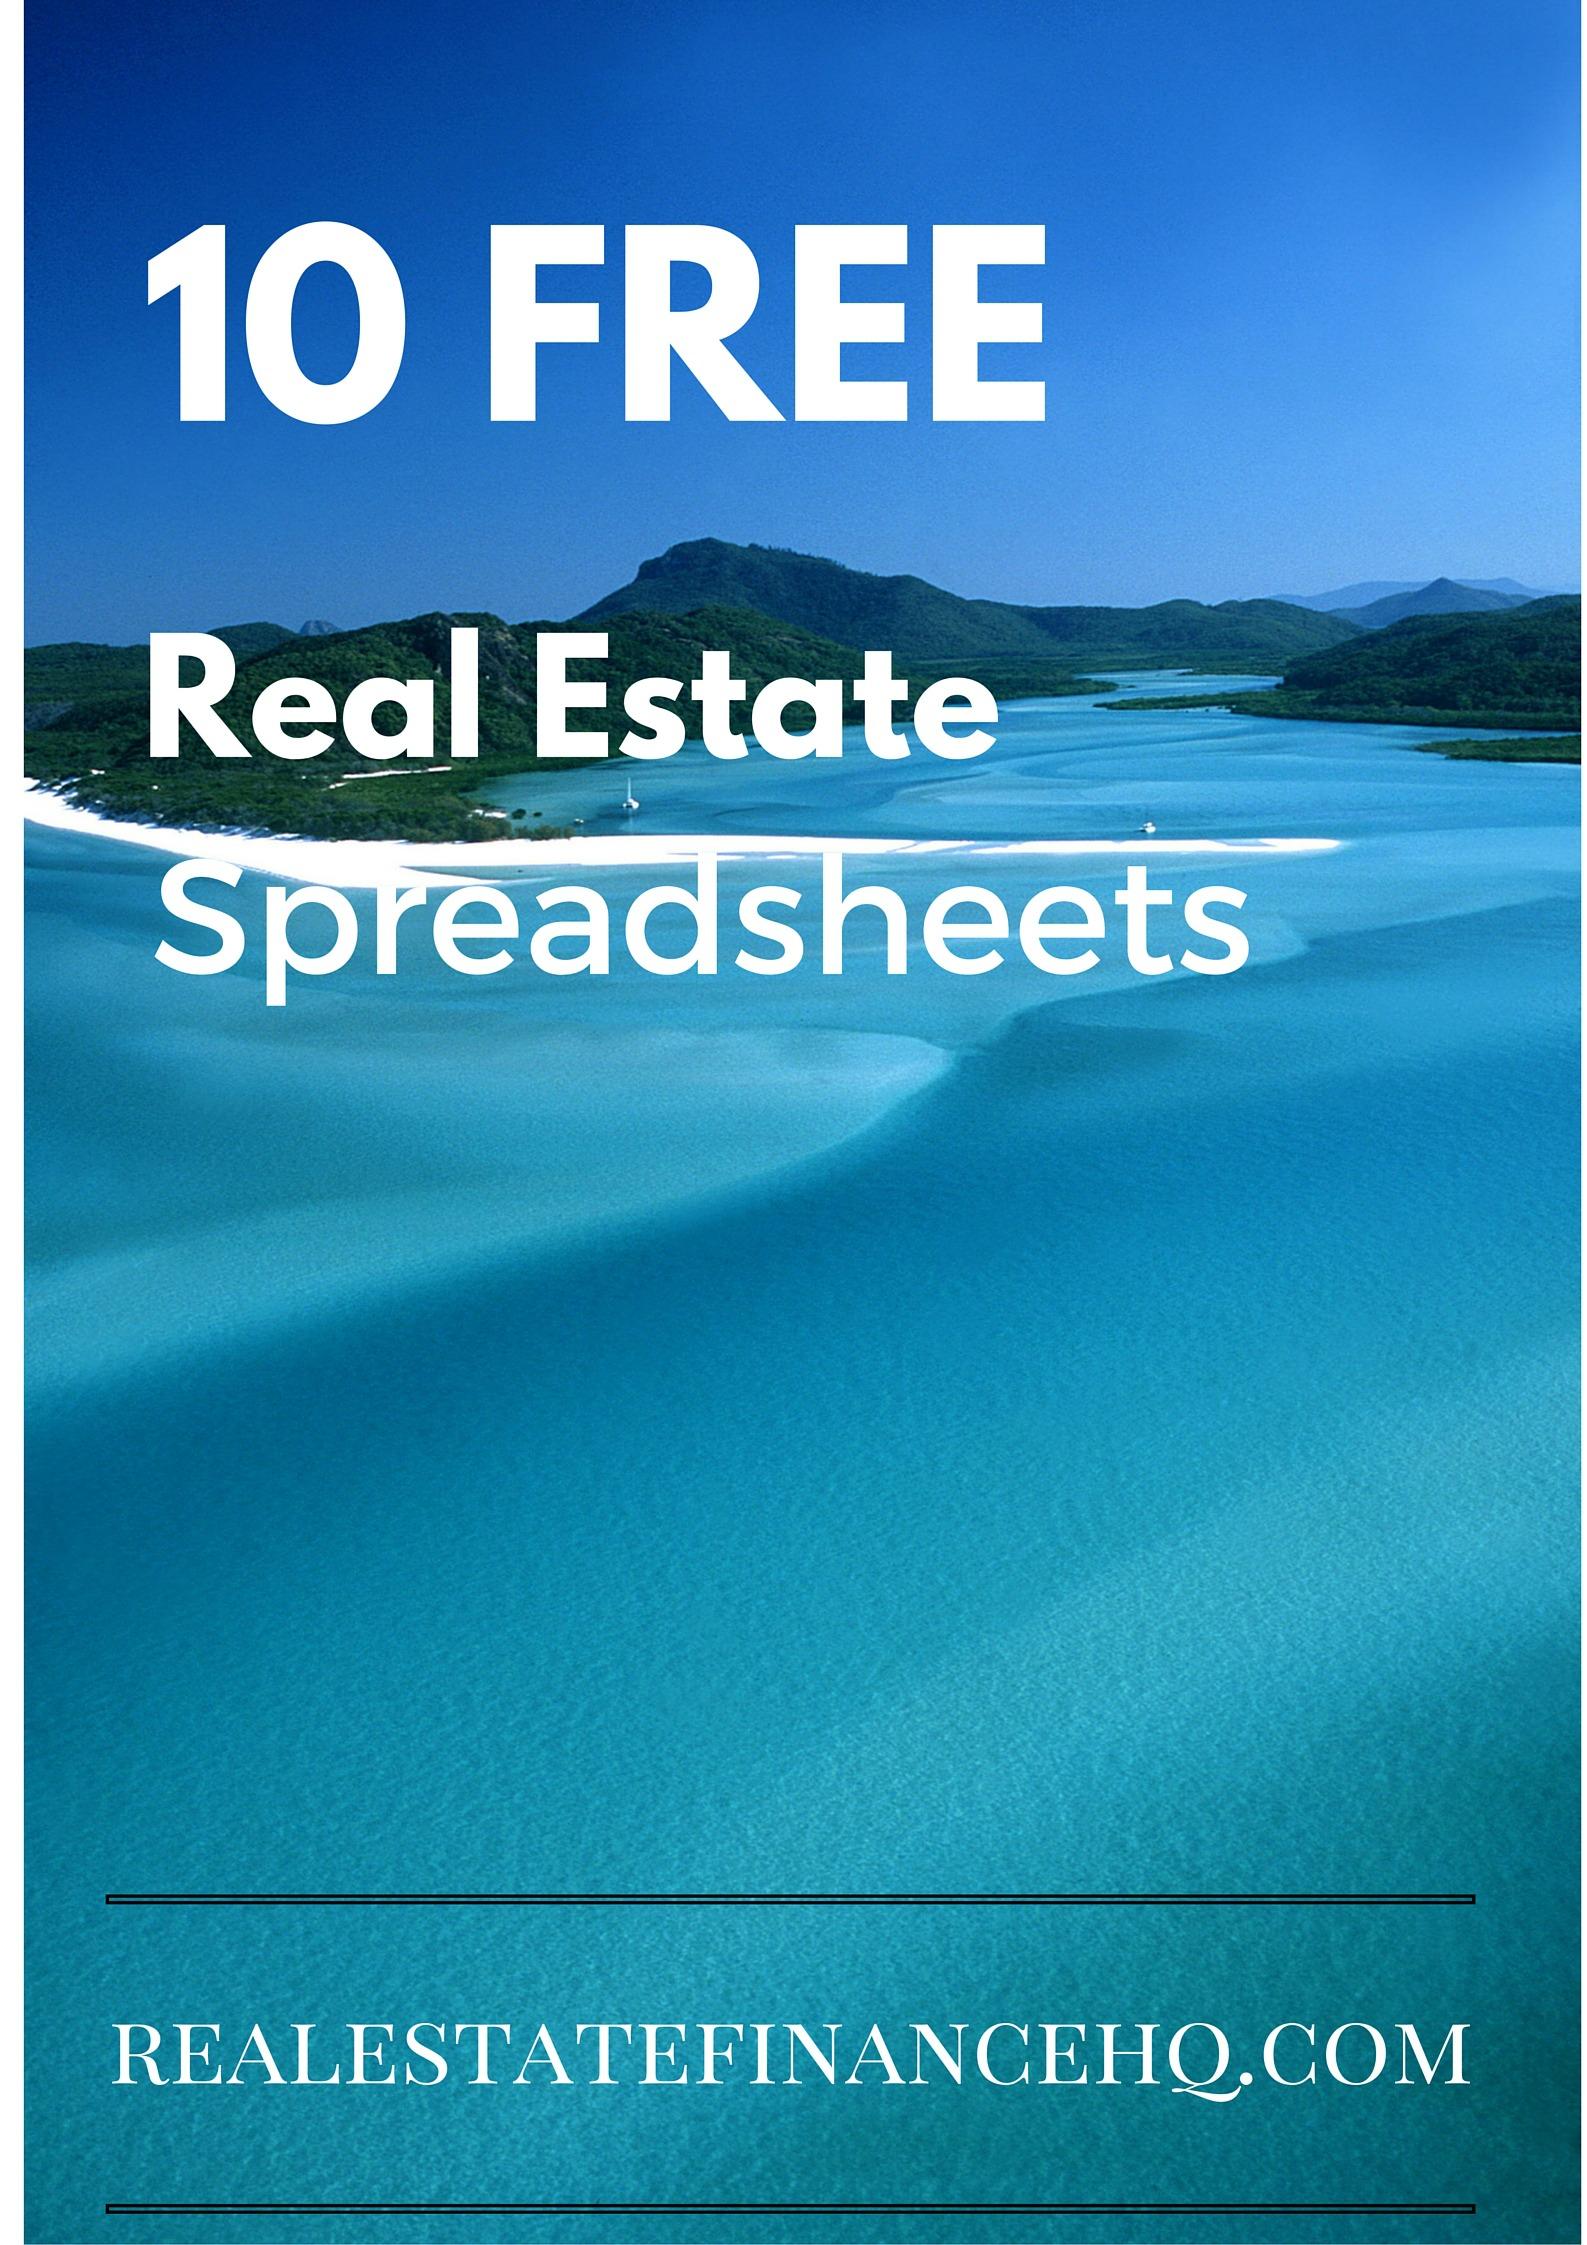 Property Evaluator Spreadsheet Regarding 10 Free Real Estate Spreadsheets  Real Estate Finance